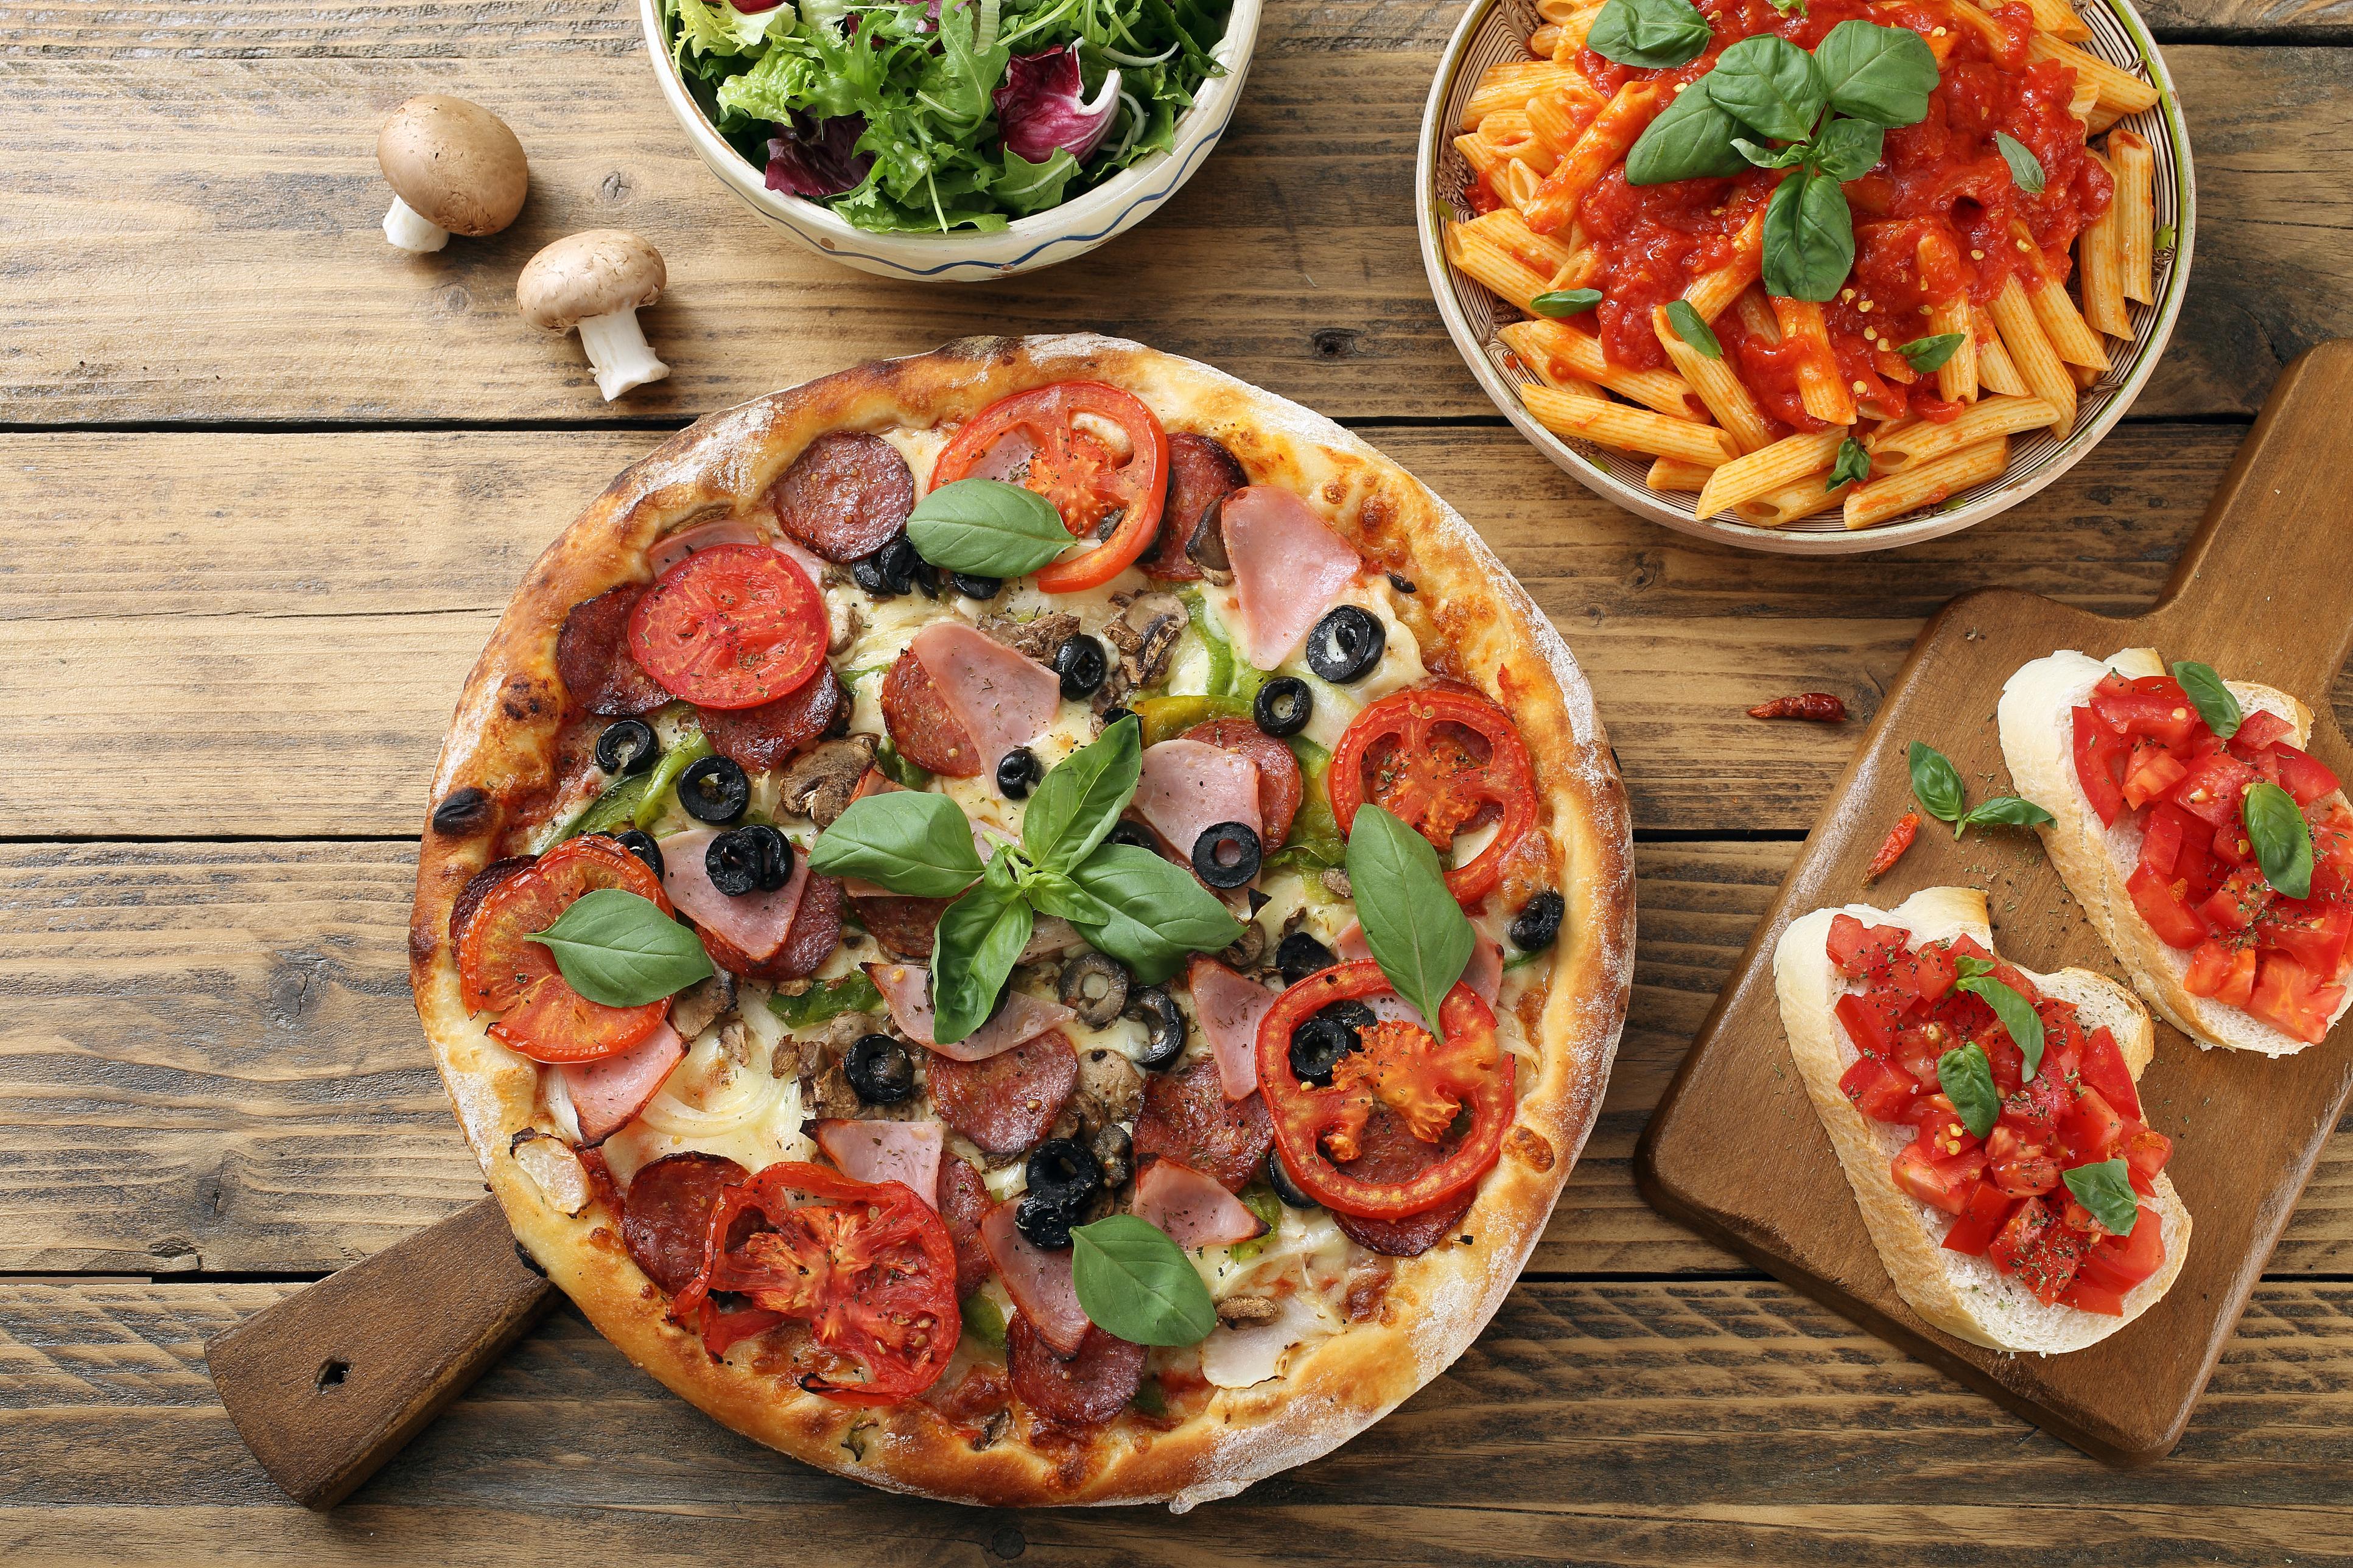 San Antonio Restaurant Week: Featuring Di Frabo and Aldaco's